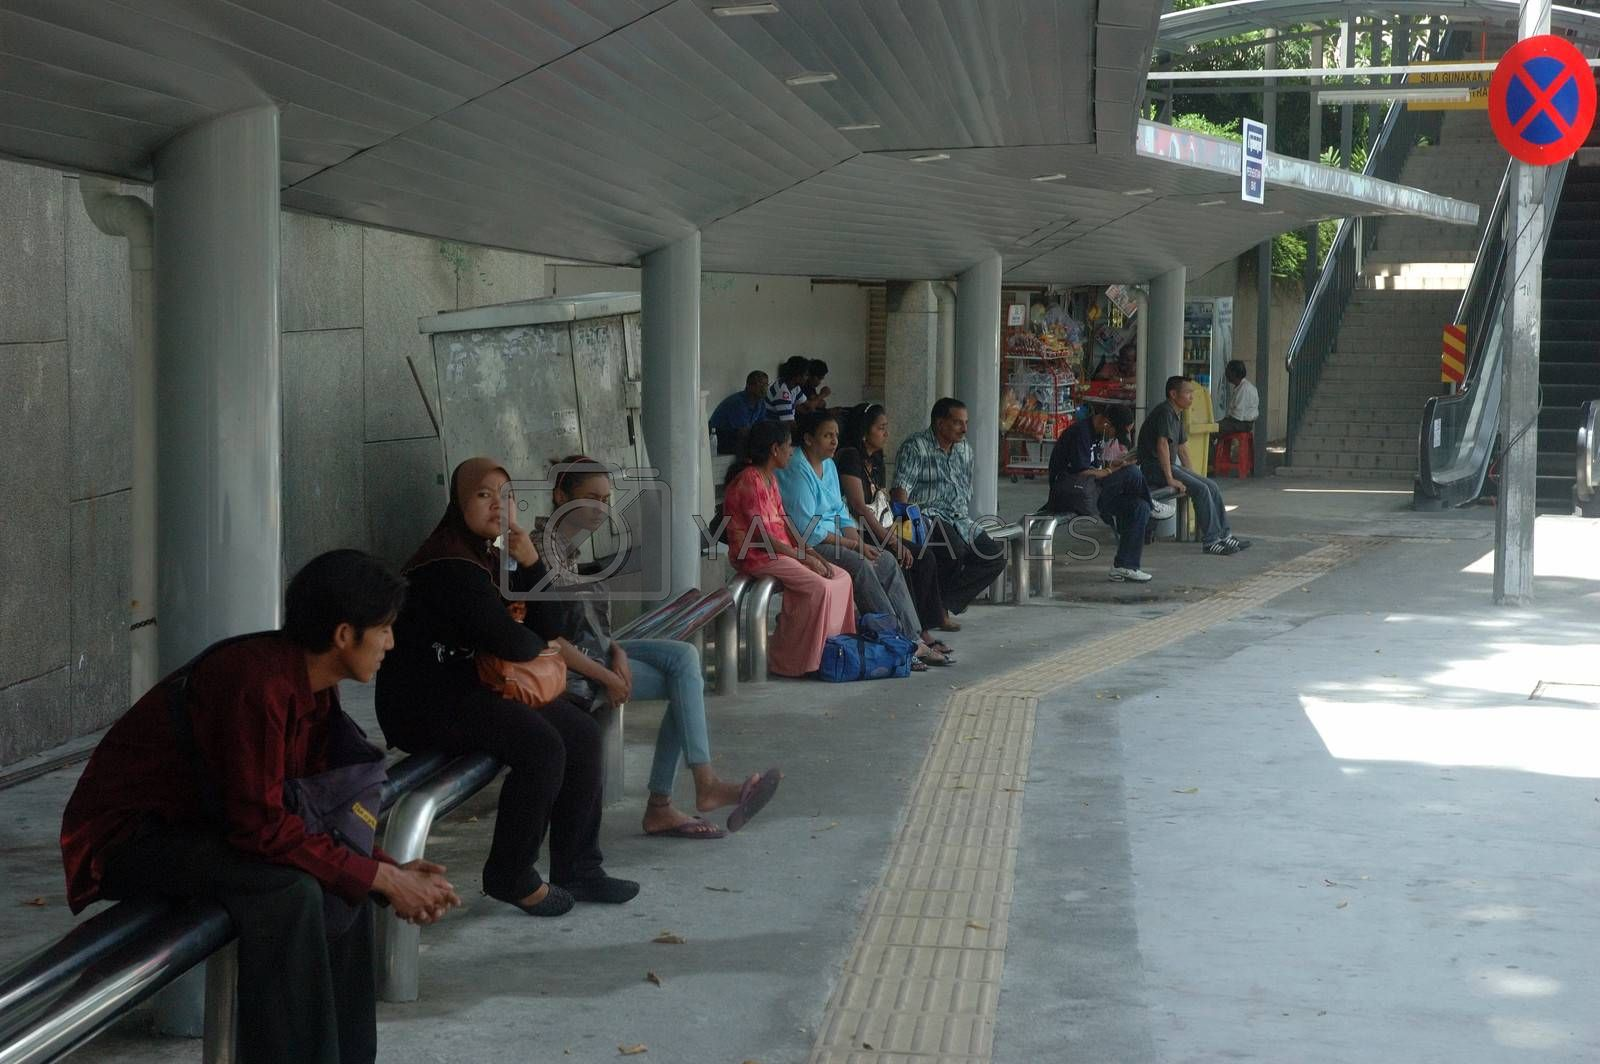 Kuala Lumpur, Malaysia - June 8, 2013: Malaysian people waiting for bus in shelter.